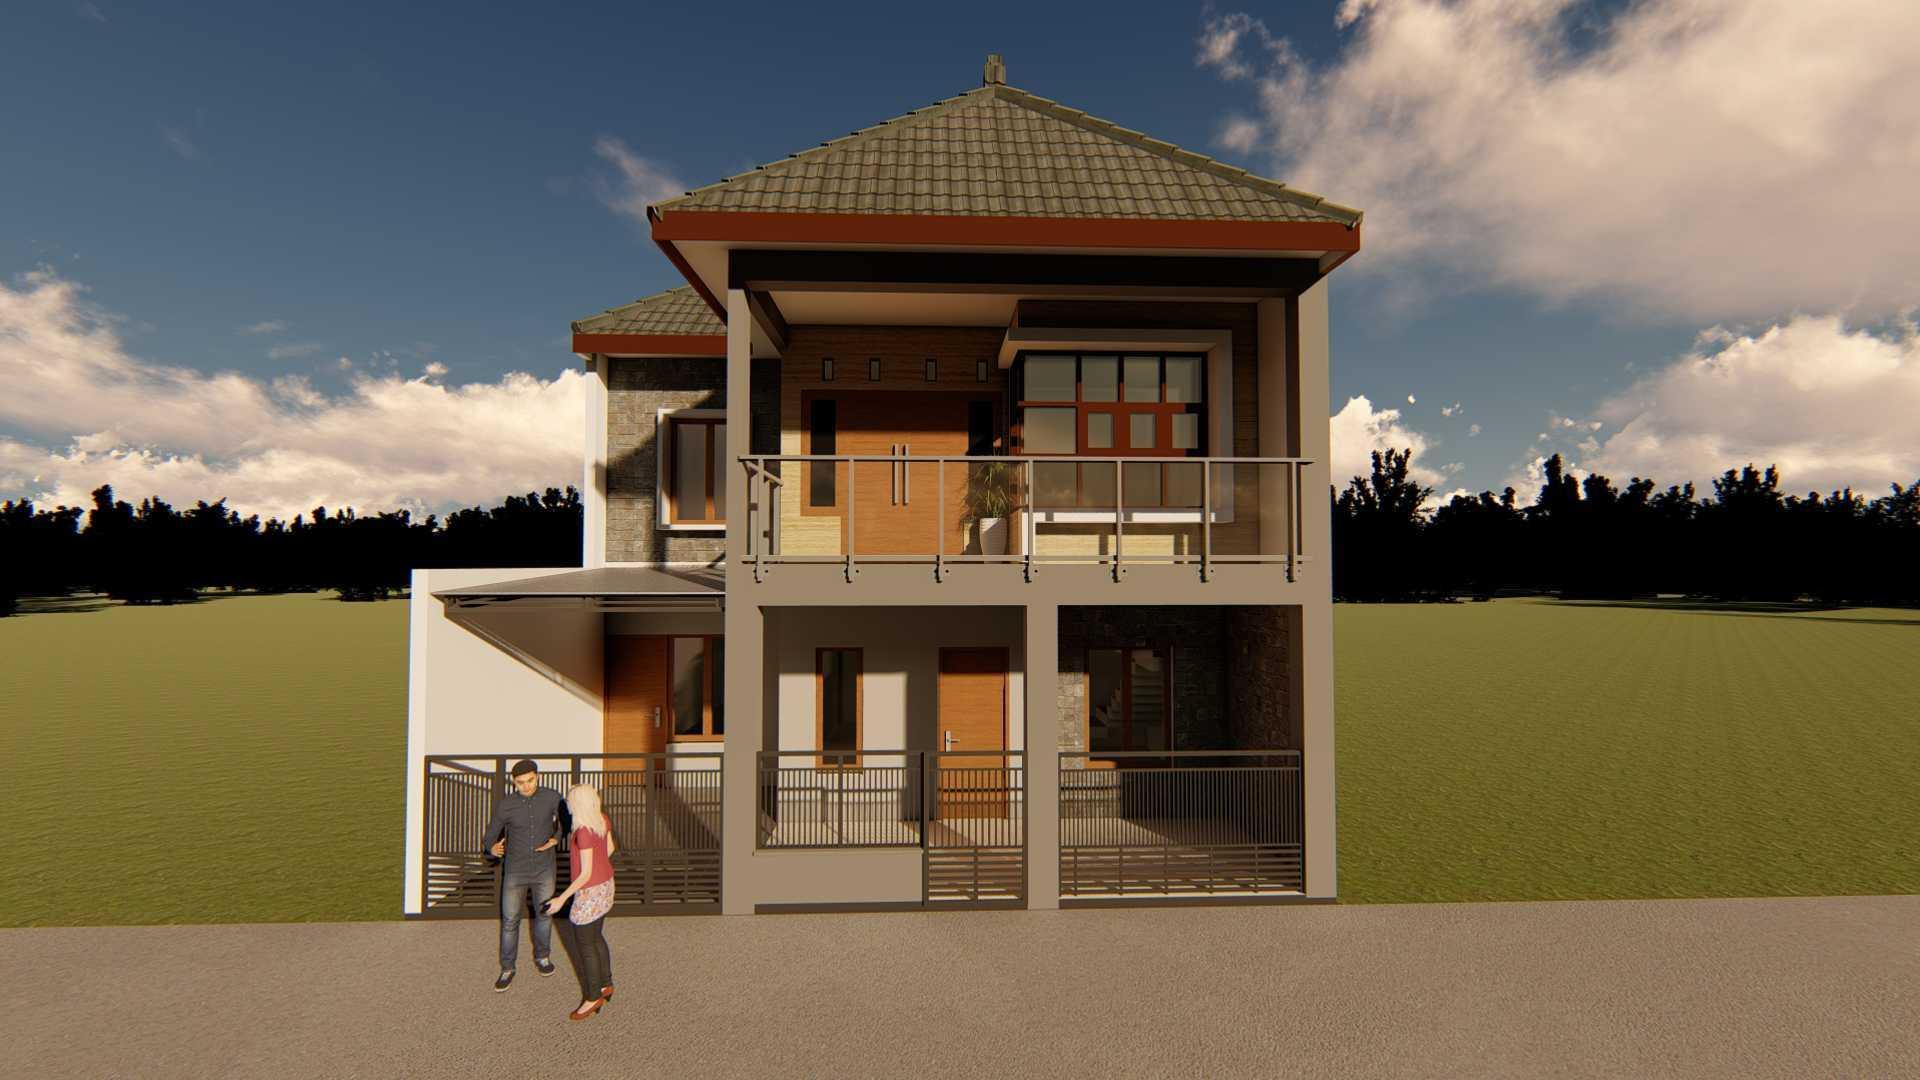 Astabumi Studio Ag House Wates Wates, Kabupaten Kulon Progo, Daerah Istimewa Yogyakarta, Indonesia Bali Cv-Astabumi-Manunggal-Prakarsa-Rb-House-Bandung  119299